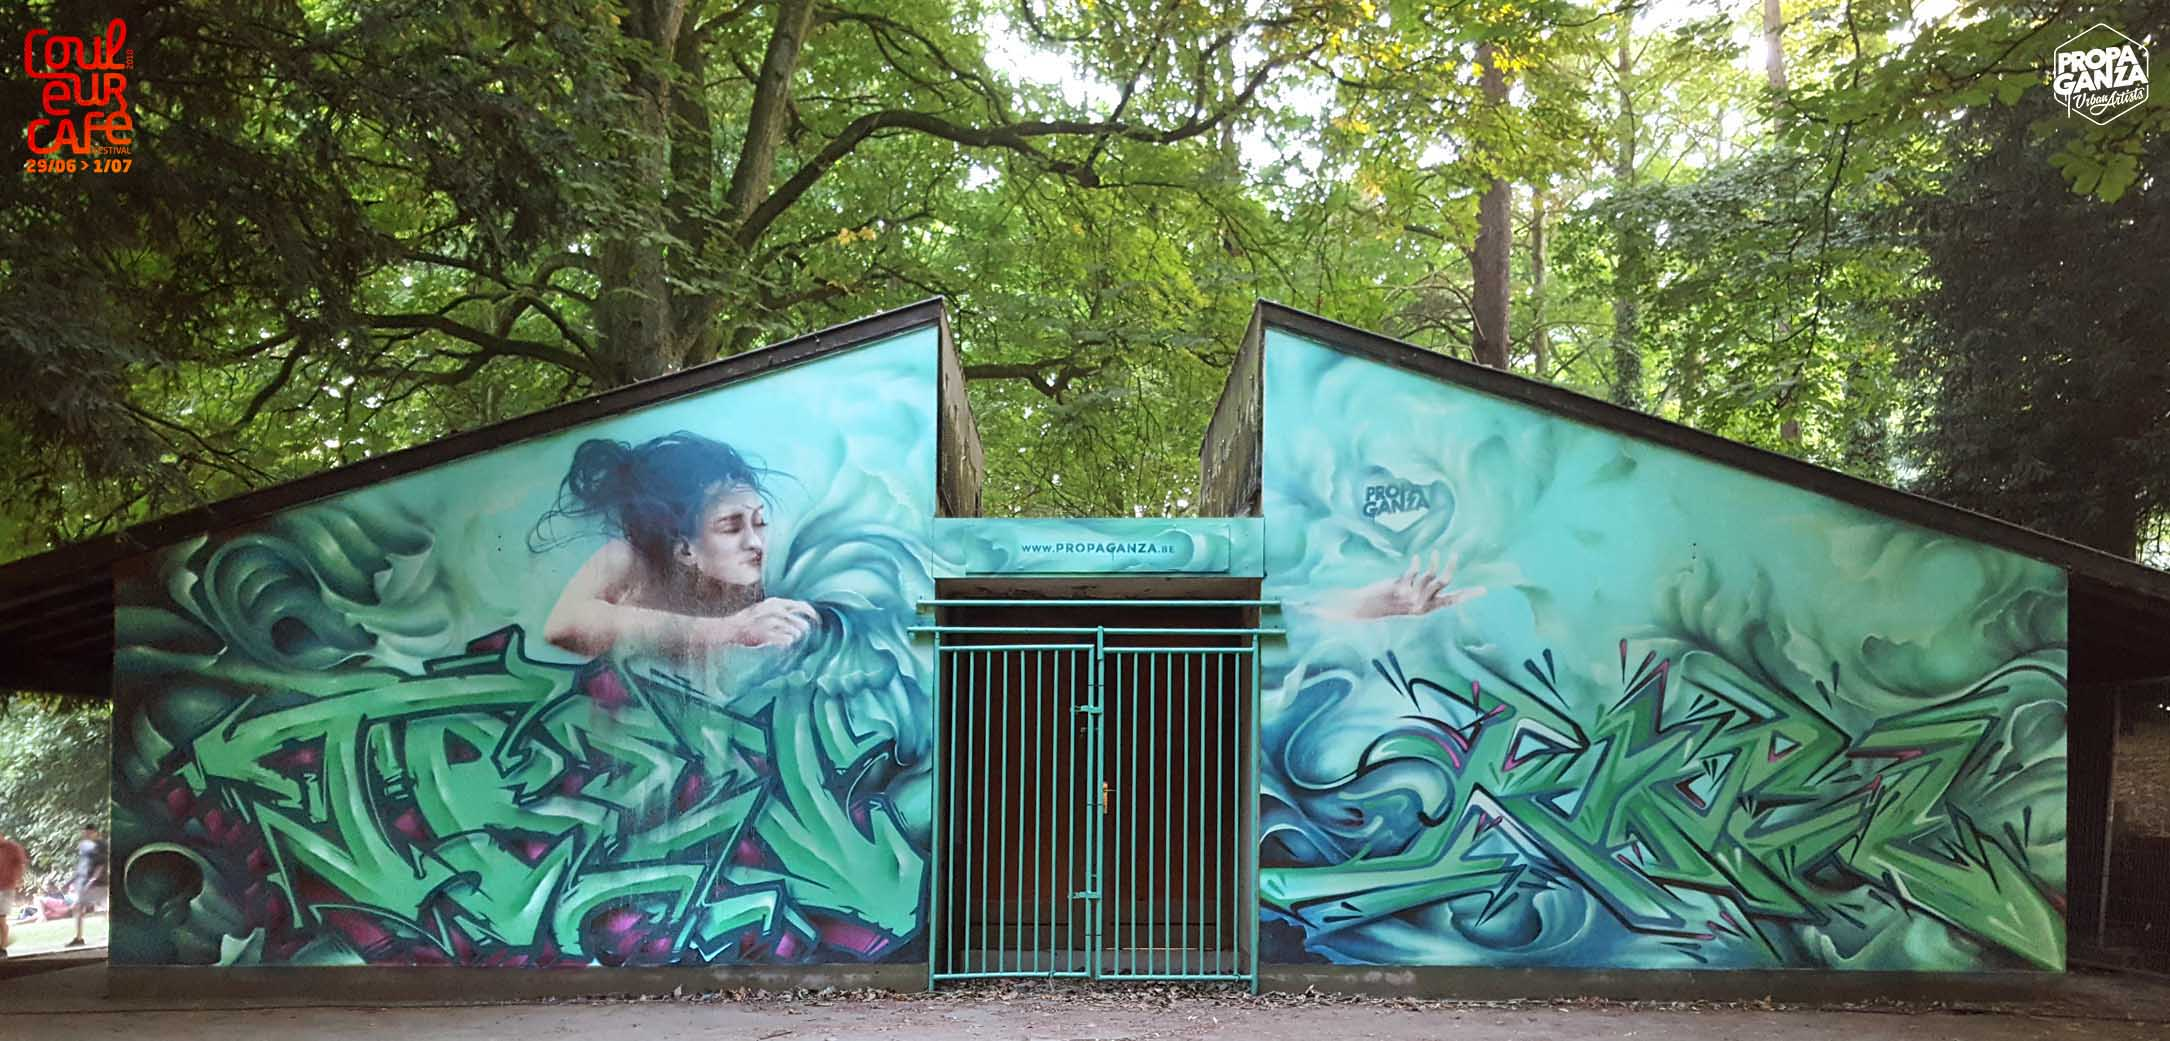 https://www.propaganza.be/wp-content/uploads/2019/04/propaganza-begium-bruxelles-couleur-cafe-artist-graffiti-street-art-spray-live-painting-trevor-orkez-iota-roubens-2018-2.jpg